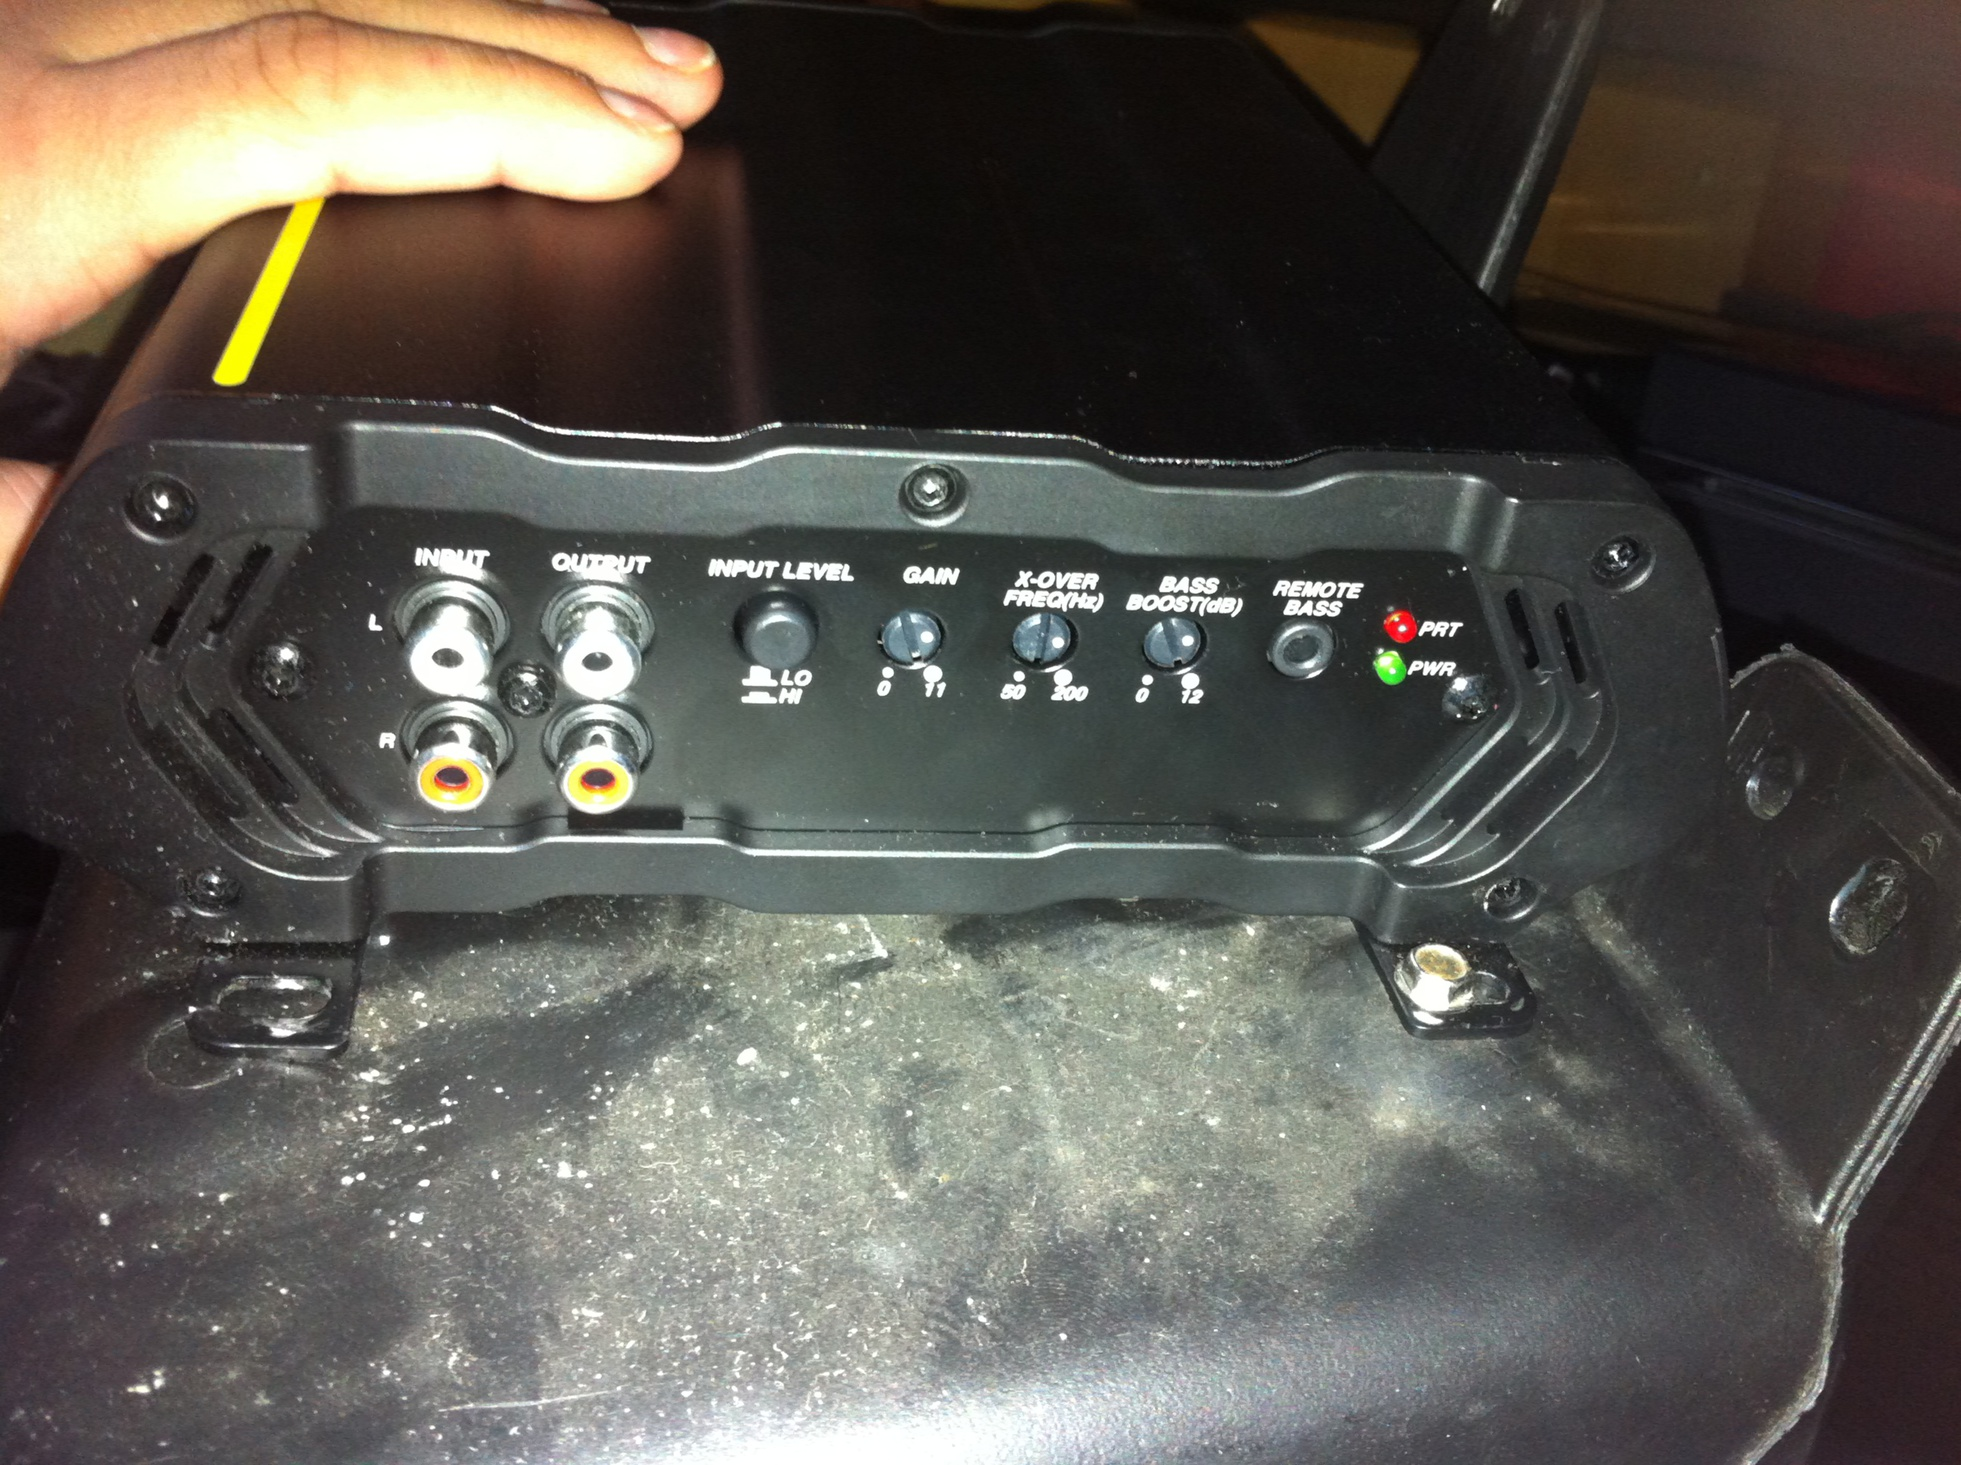 kicker cx 300 1 wiring diagram wiring diagram idatalink wiring diagram kicker cx 300 1 wiring diagram #6